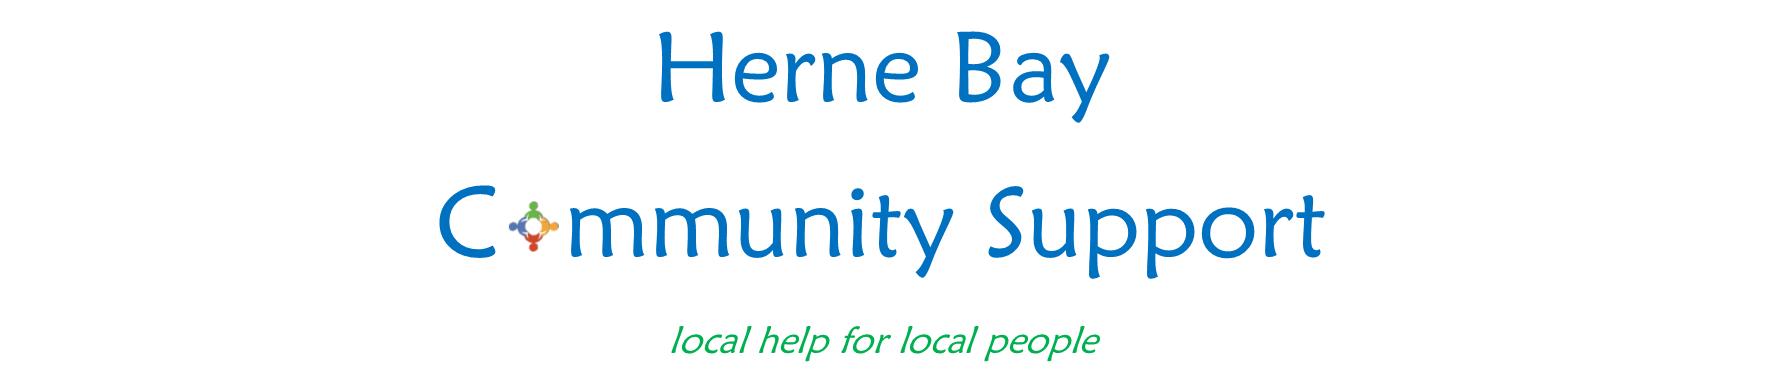 Herne Bay Community Support.png